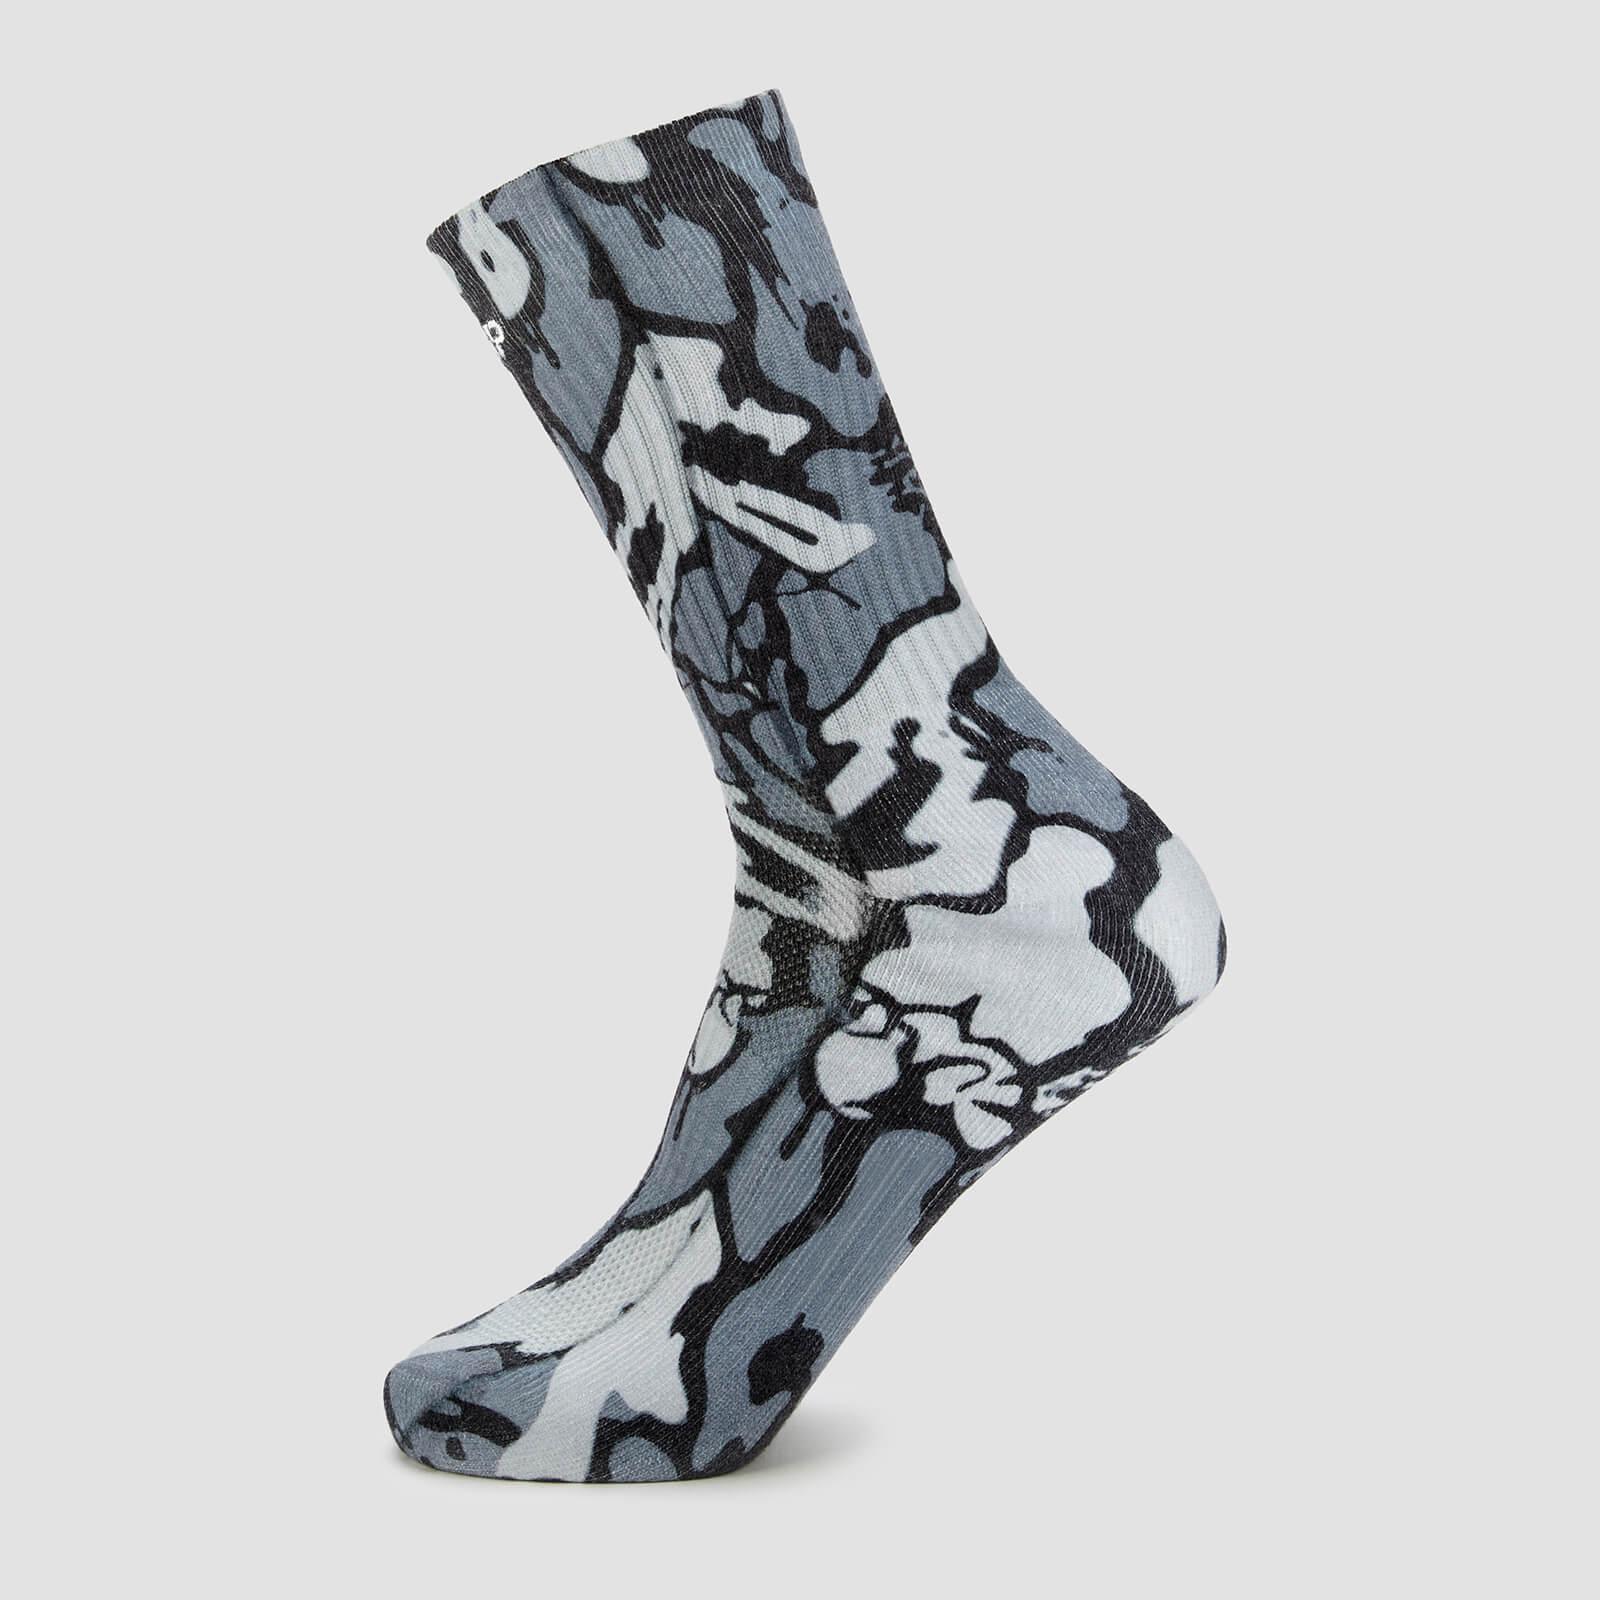 Mp X Hexxee Adapt Crew Socks - Grey Camo - Womens Uk 4-7